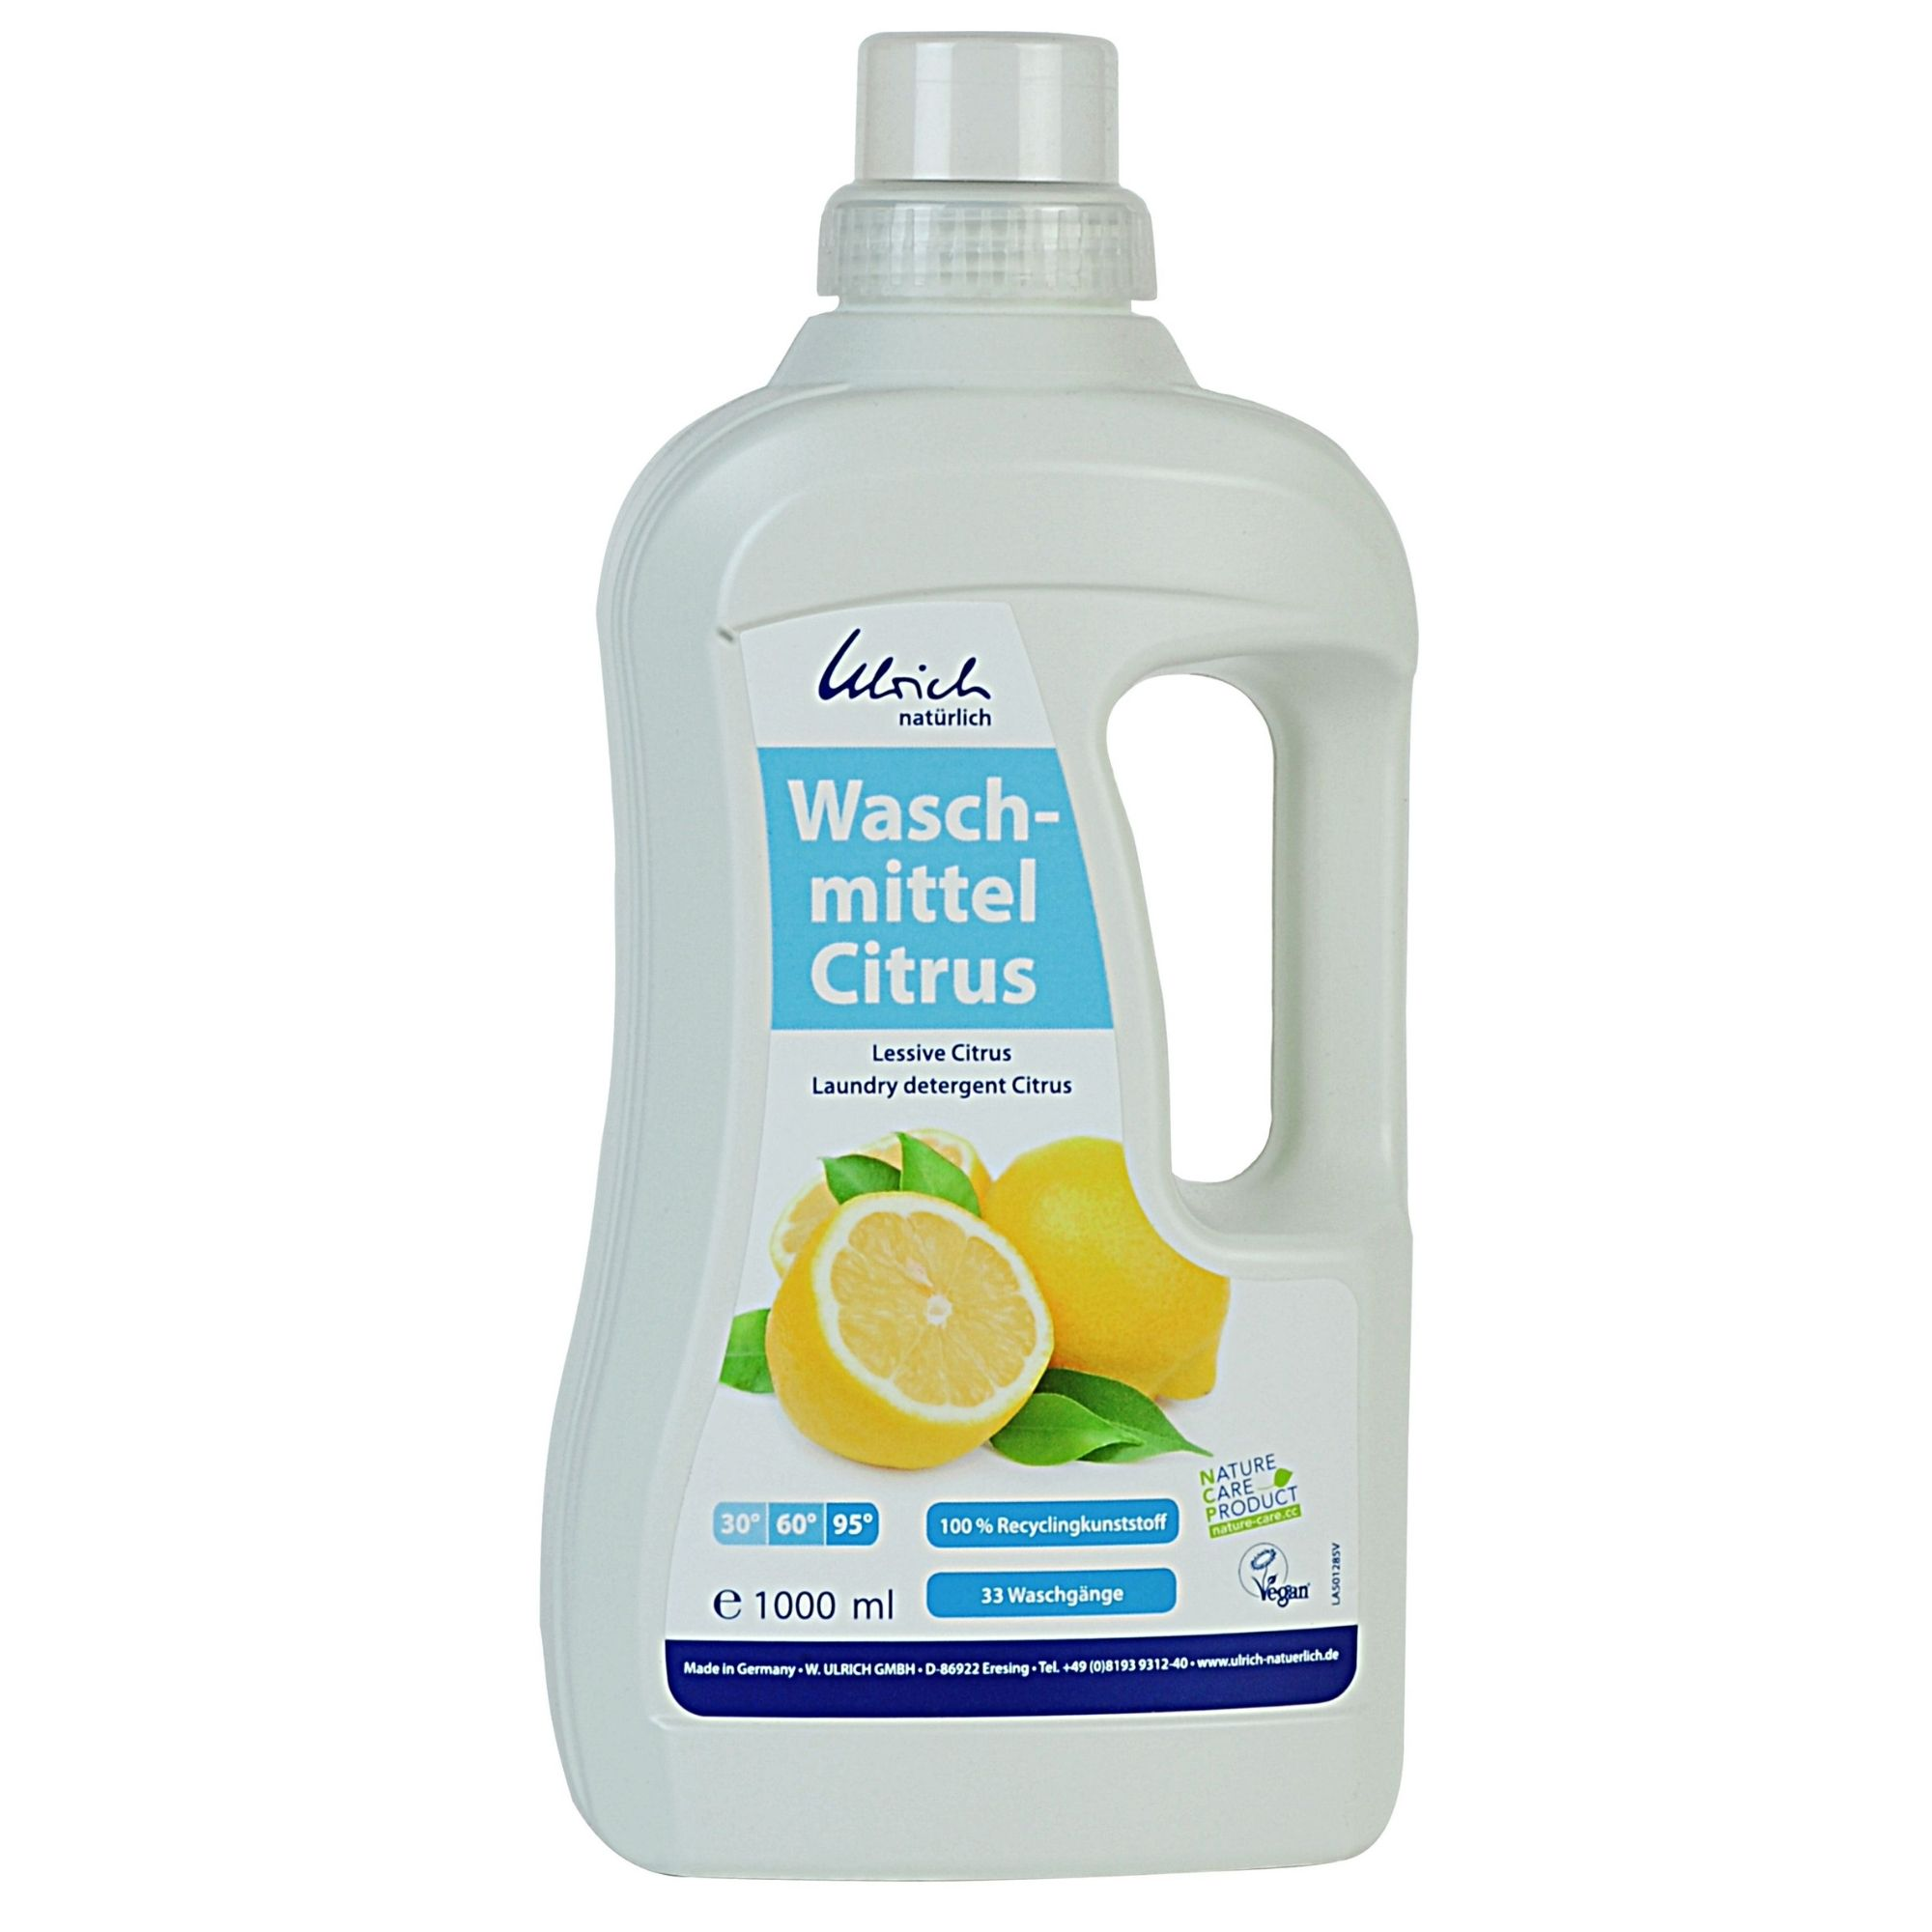 ULRICH - LESSIVE liquide classique - CITRUS, 1L